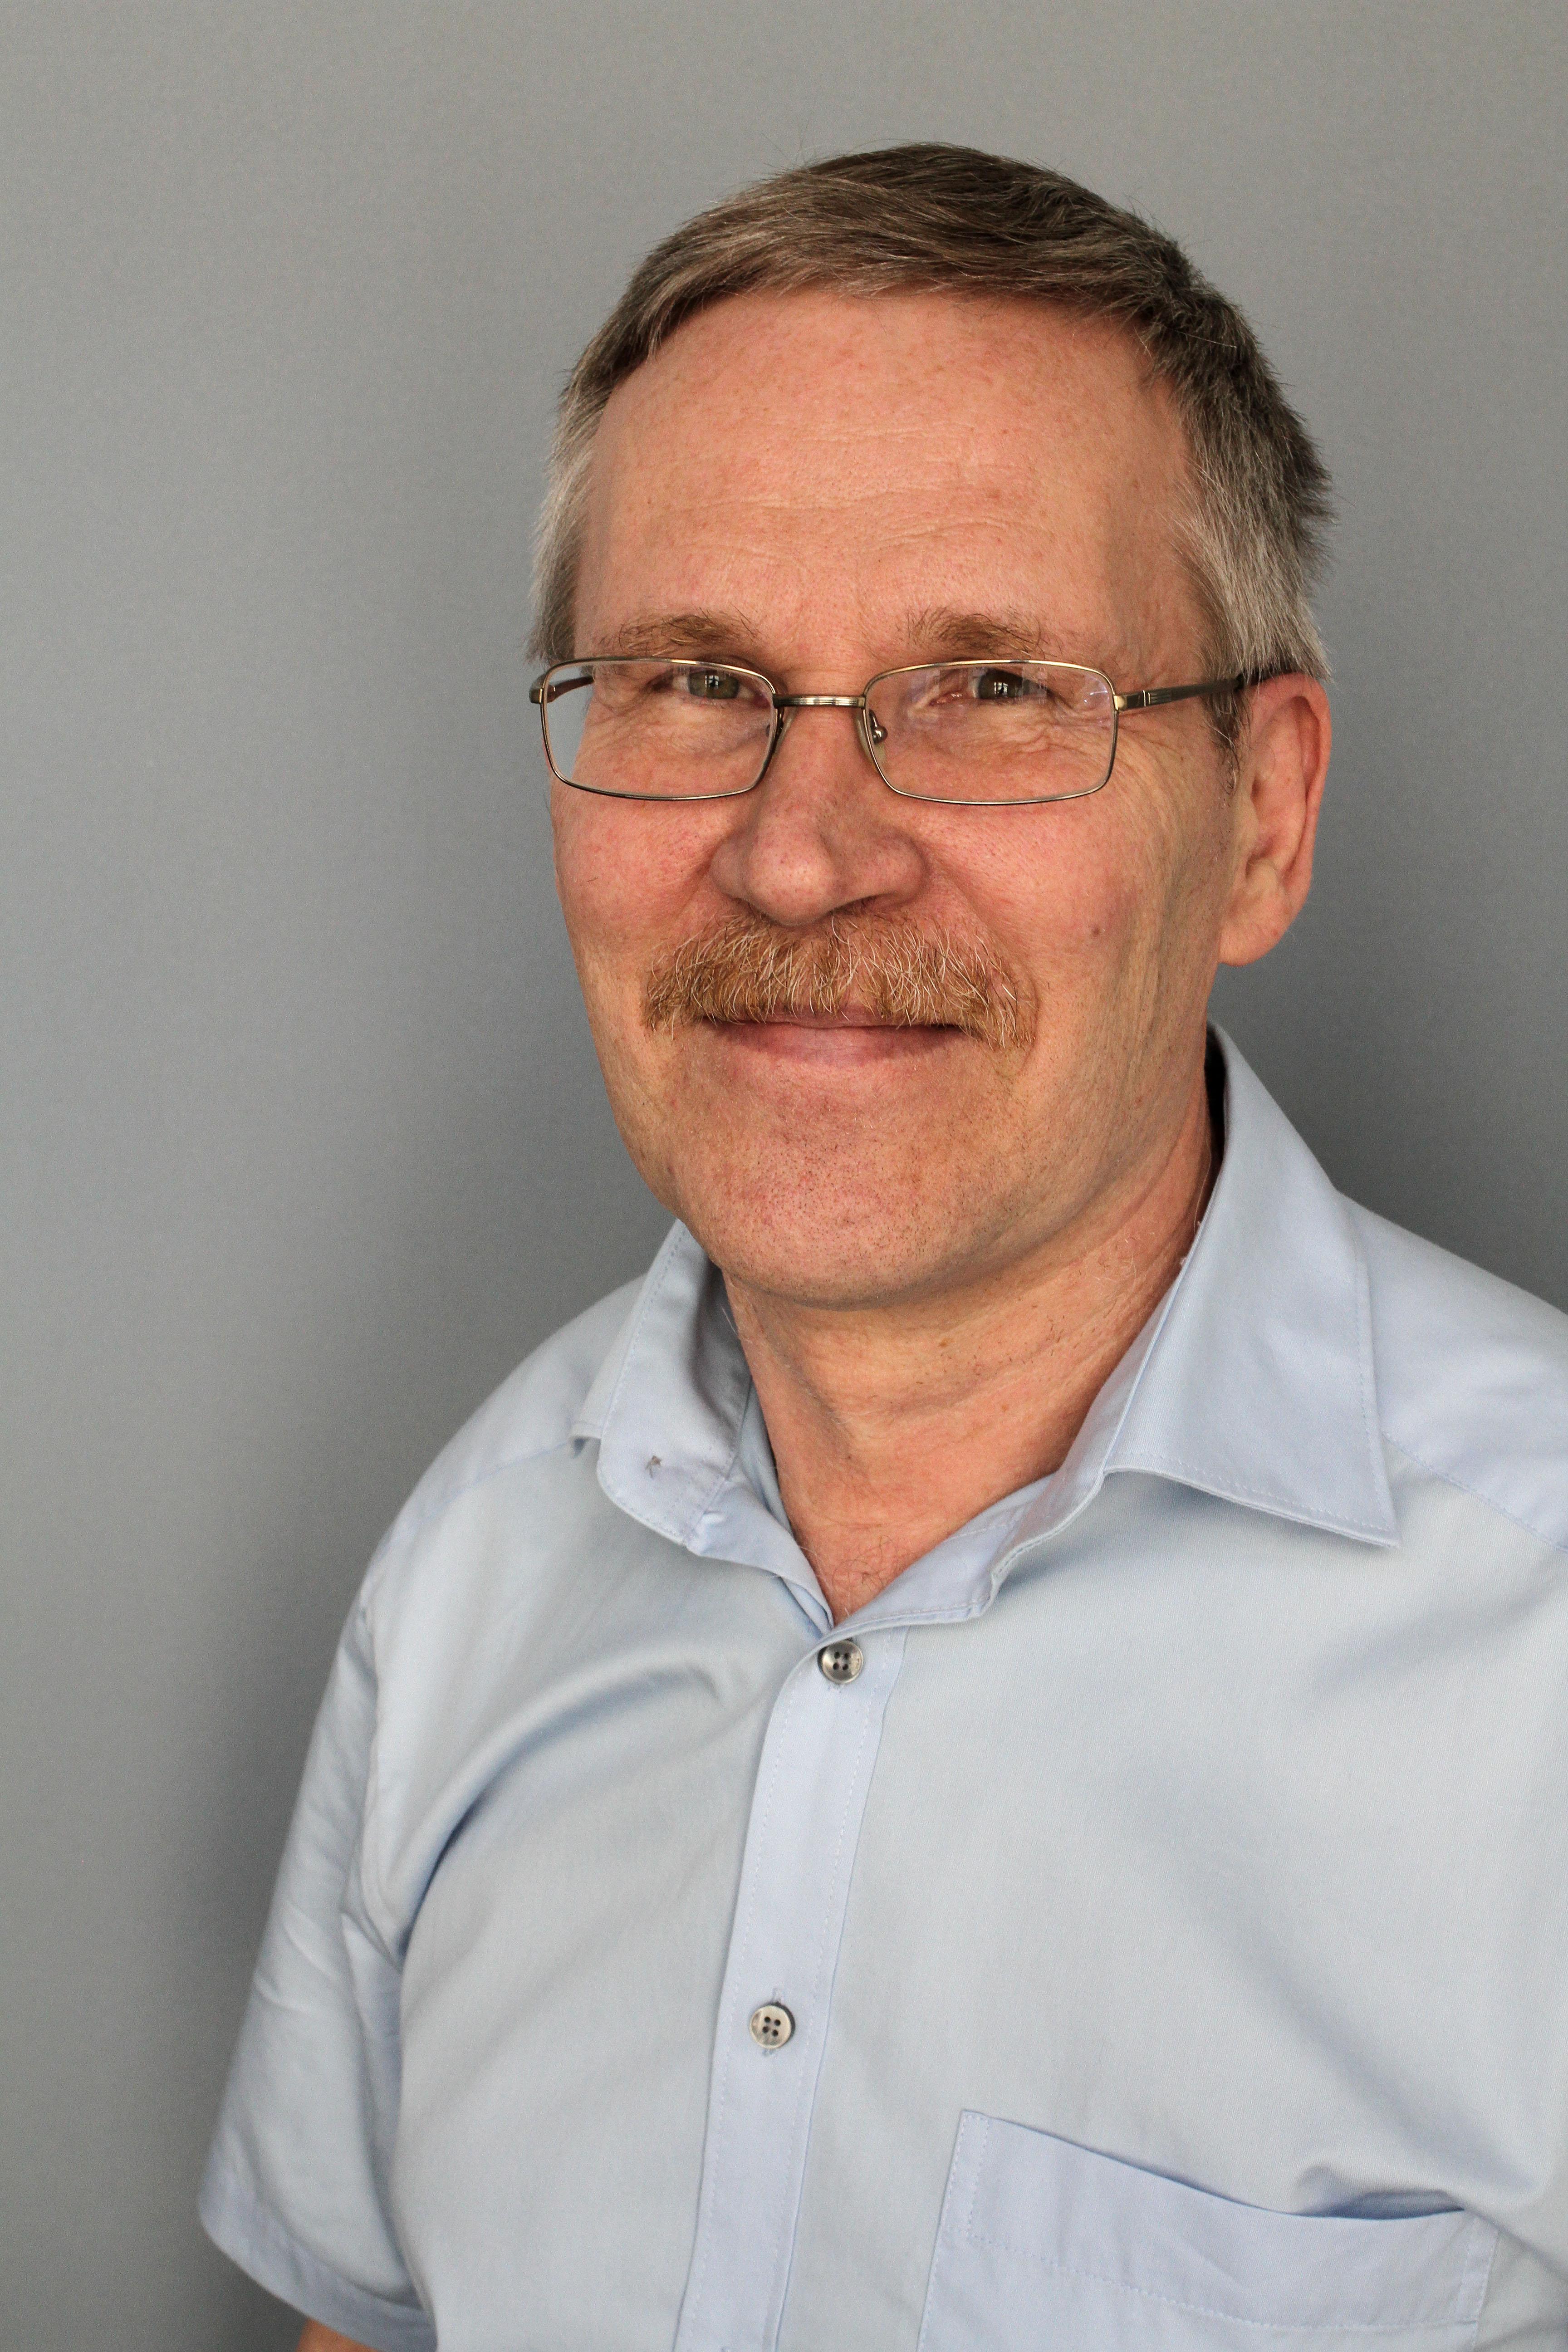 Pekka Vilkamaa